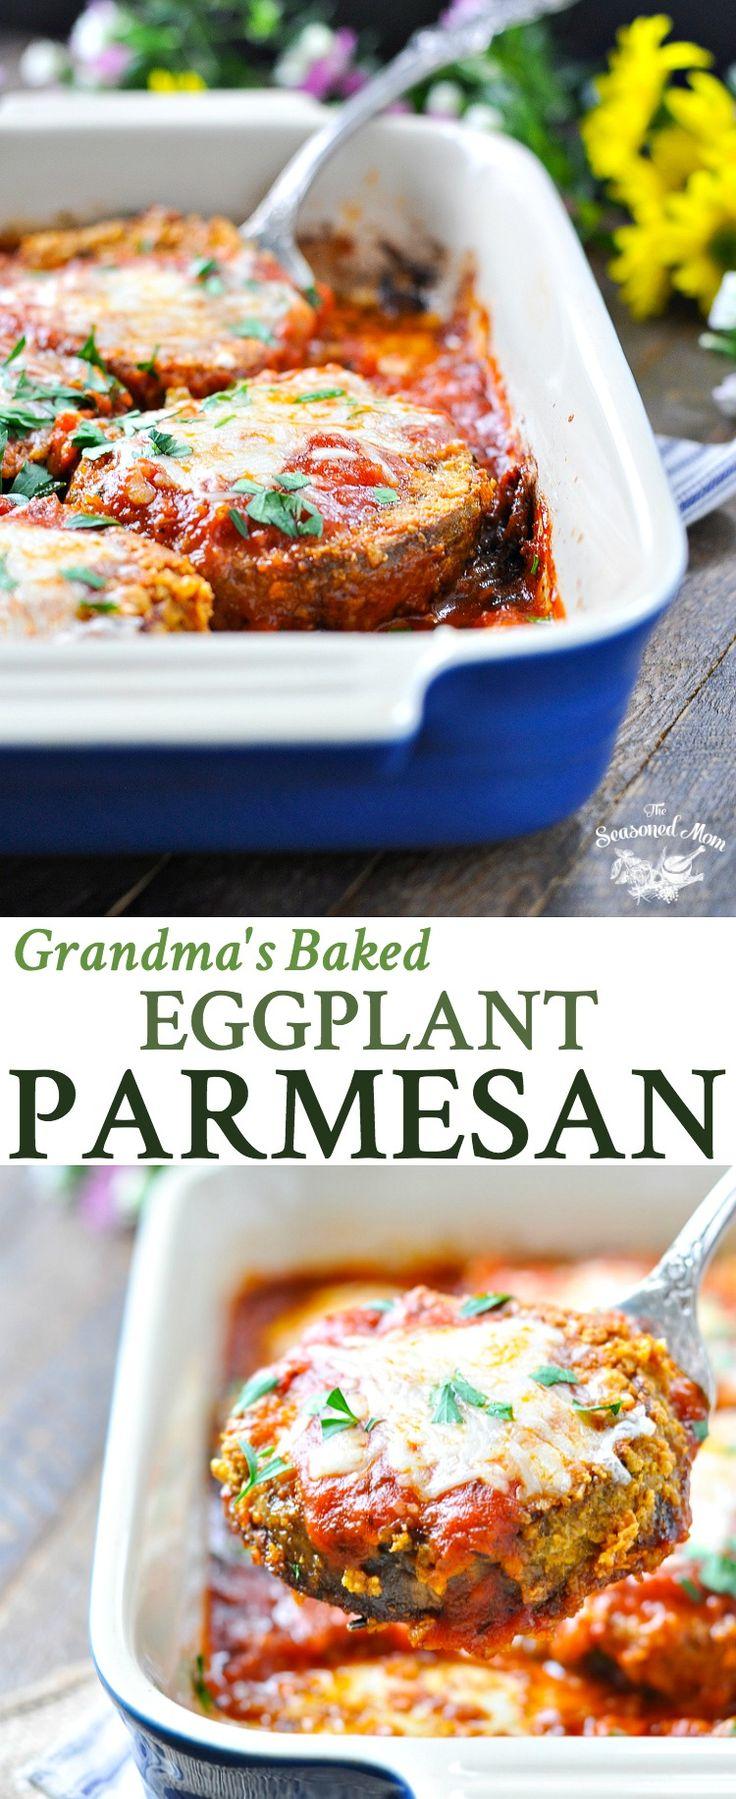 Grandma's Baked Eggplant Parmesan | Vegetarian Recipes Easy | Vegetarian Meals | Easy Dinner Recipes | Dinner Ideas | Italian Recipes | Italian Food | Healthy Recipes | Dinner Recipes Healthy | Healthy Dinner Ideas | Healthy Dinners (Healthy Summer Bake)